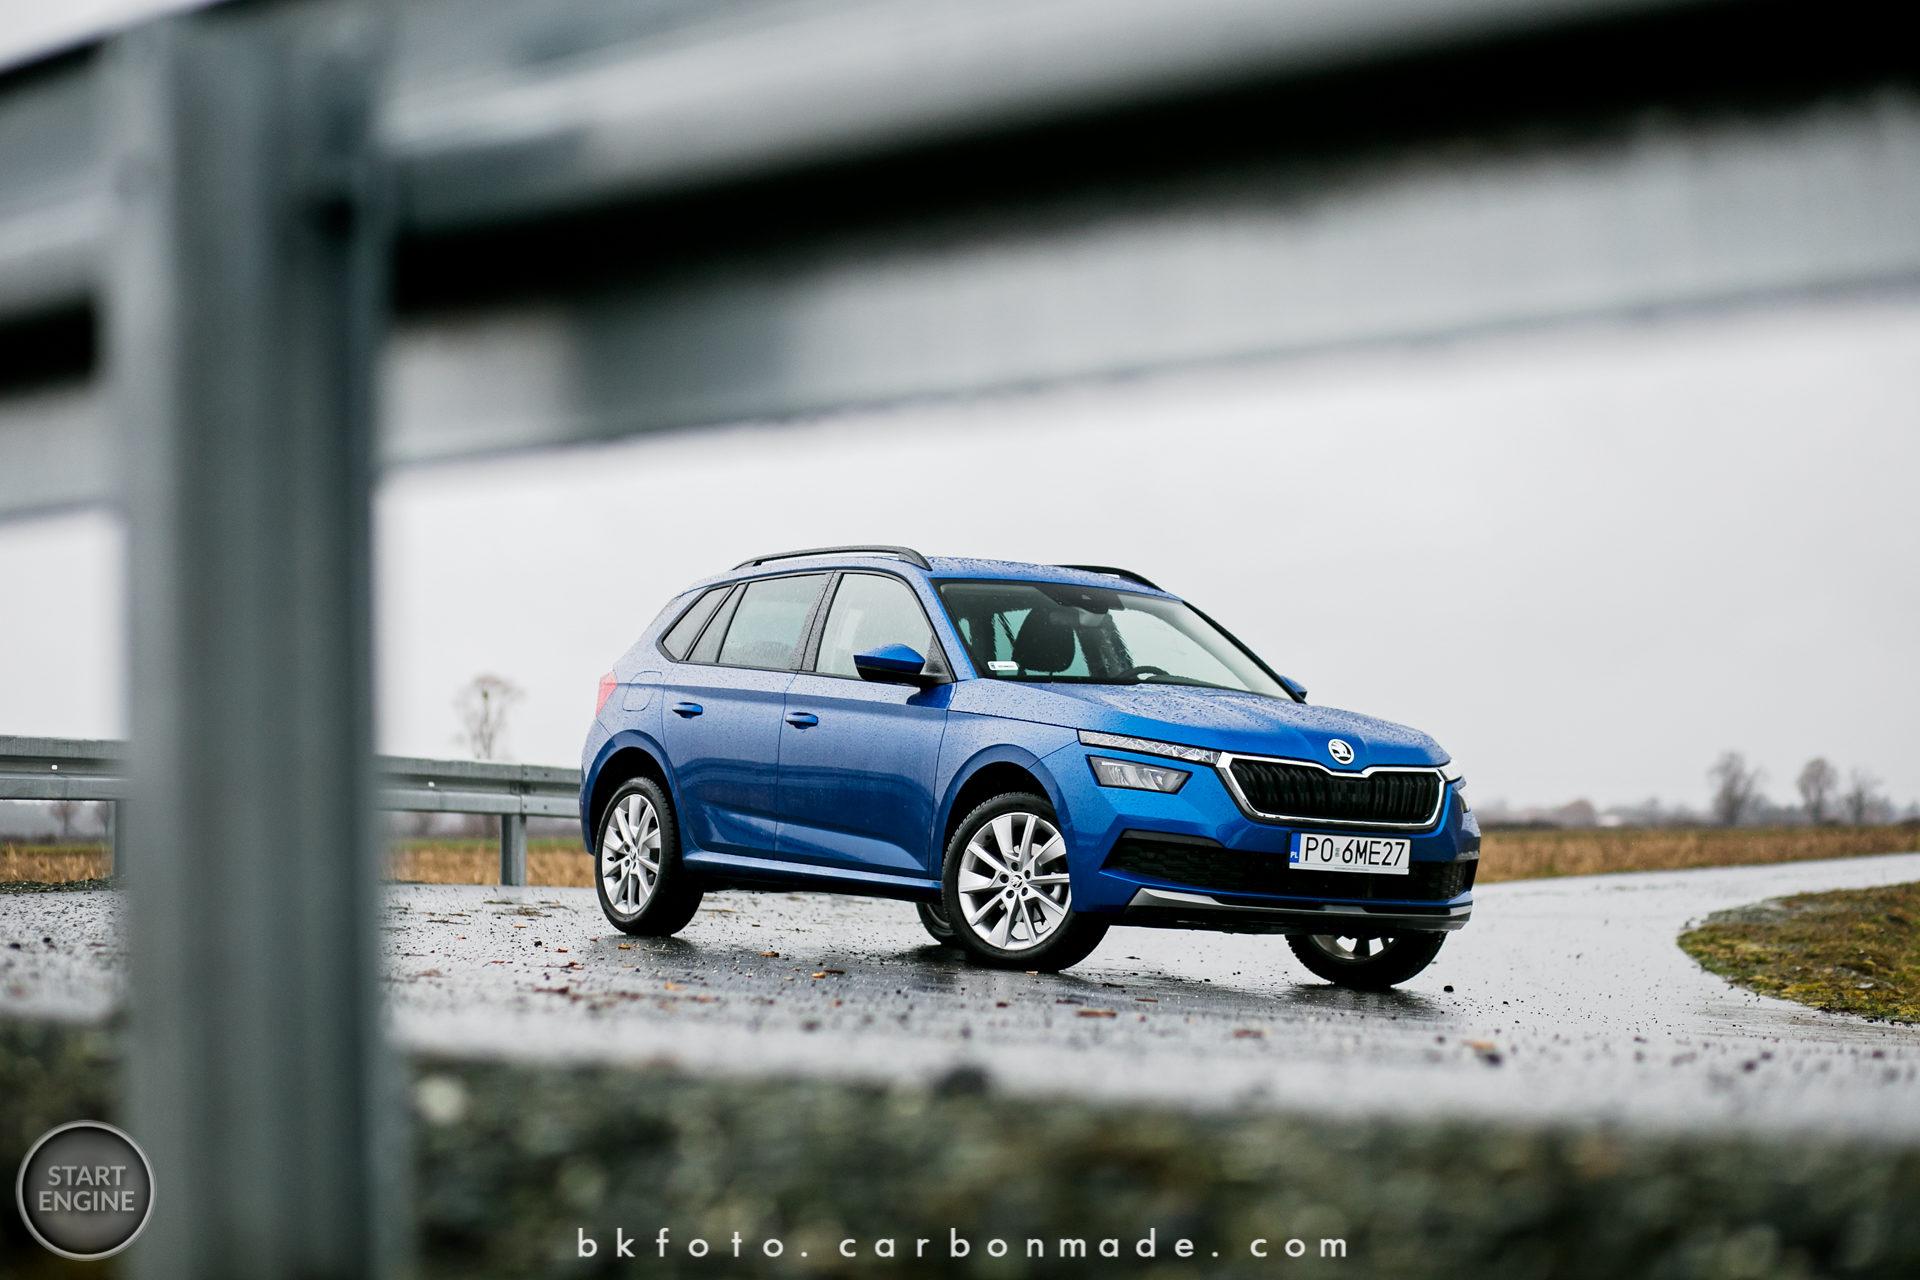 Škoda Kamiq Ambition 1.0 TSI 95 KM 5MT